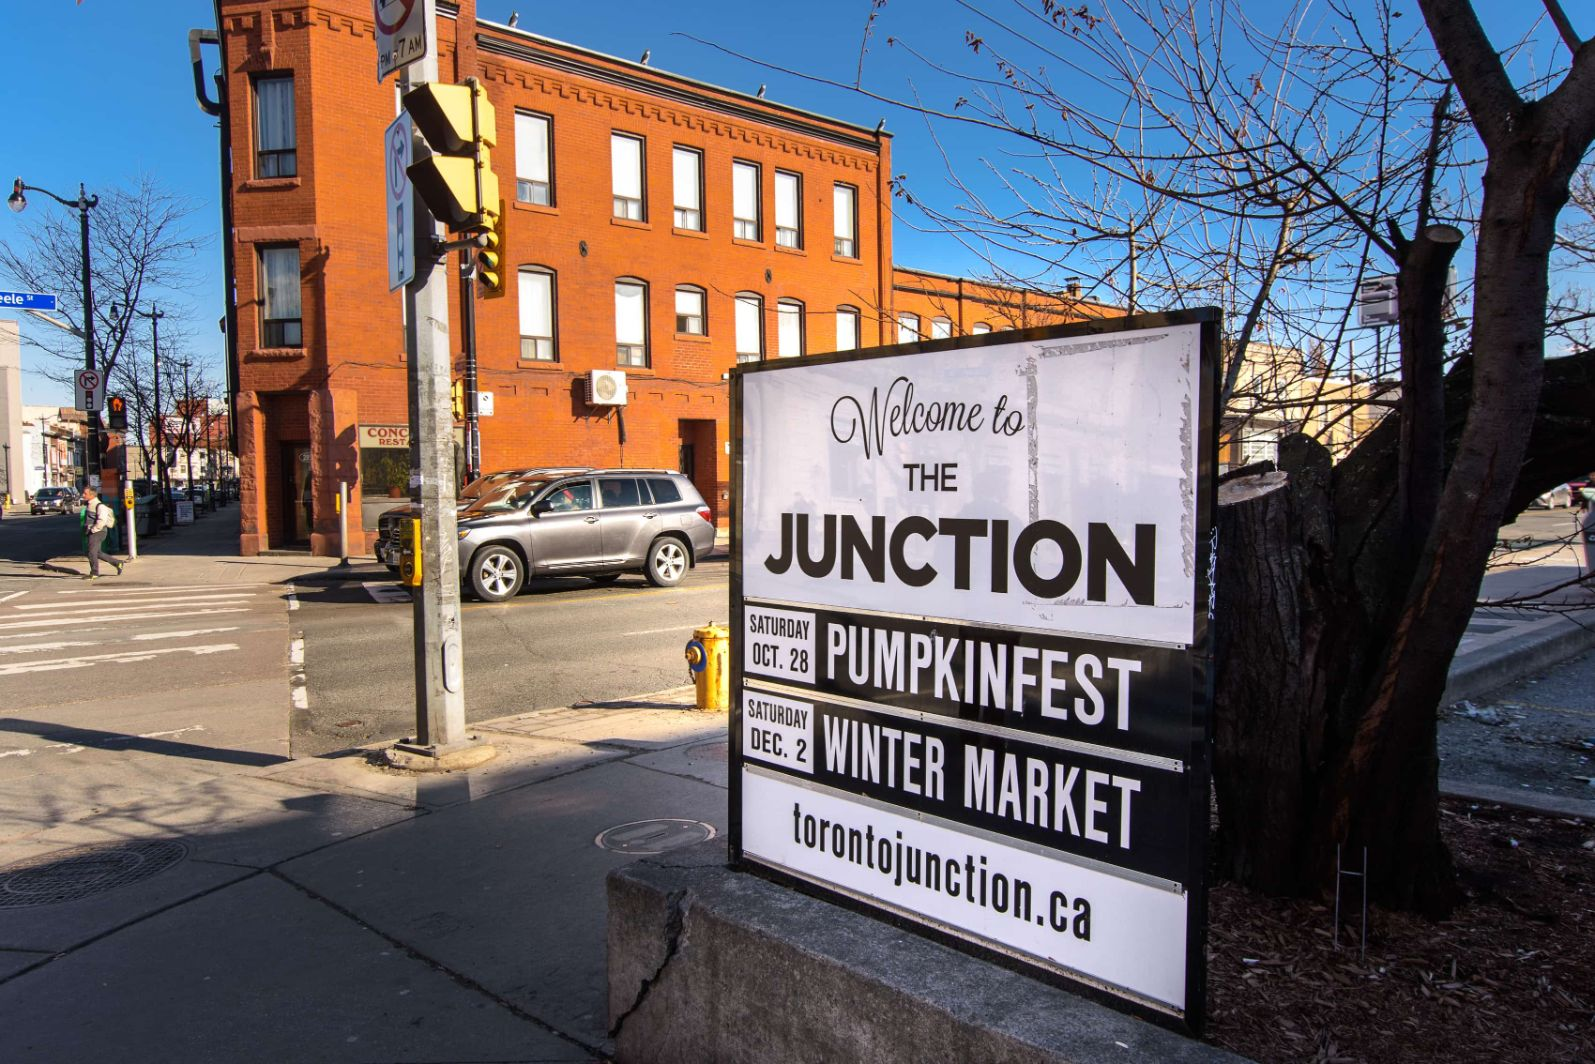 toronto-welcome-to-junction-neighbourhood